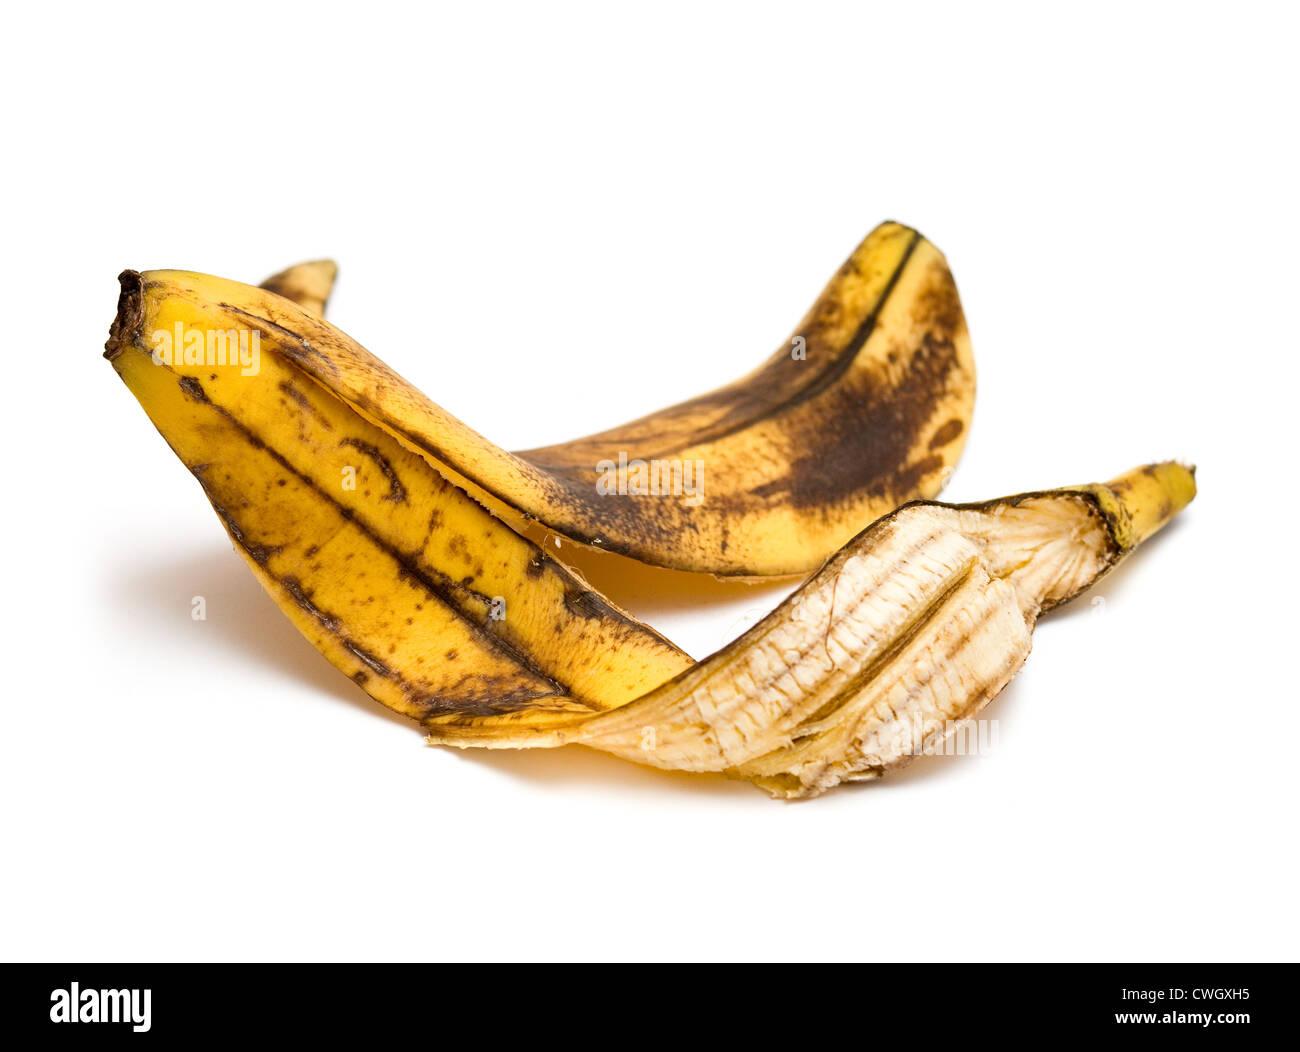 Banana peel for mistake concept - Stock Image